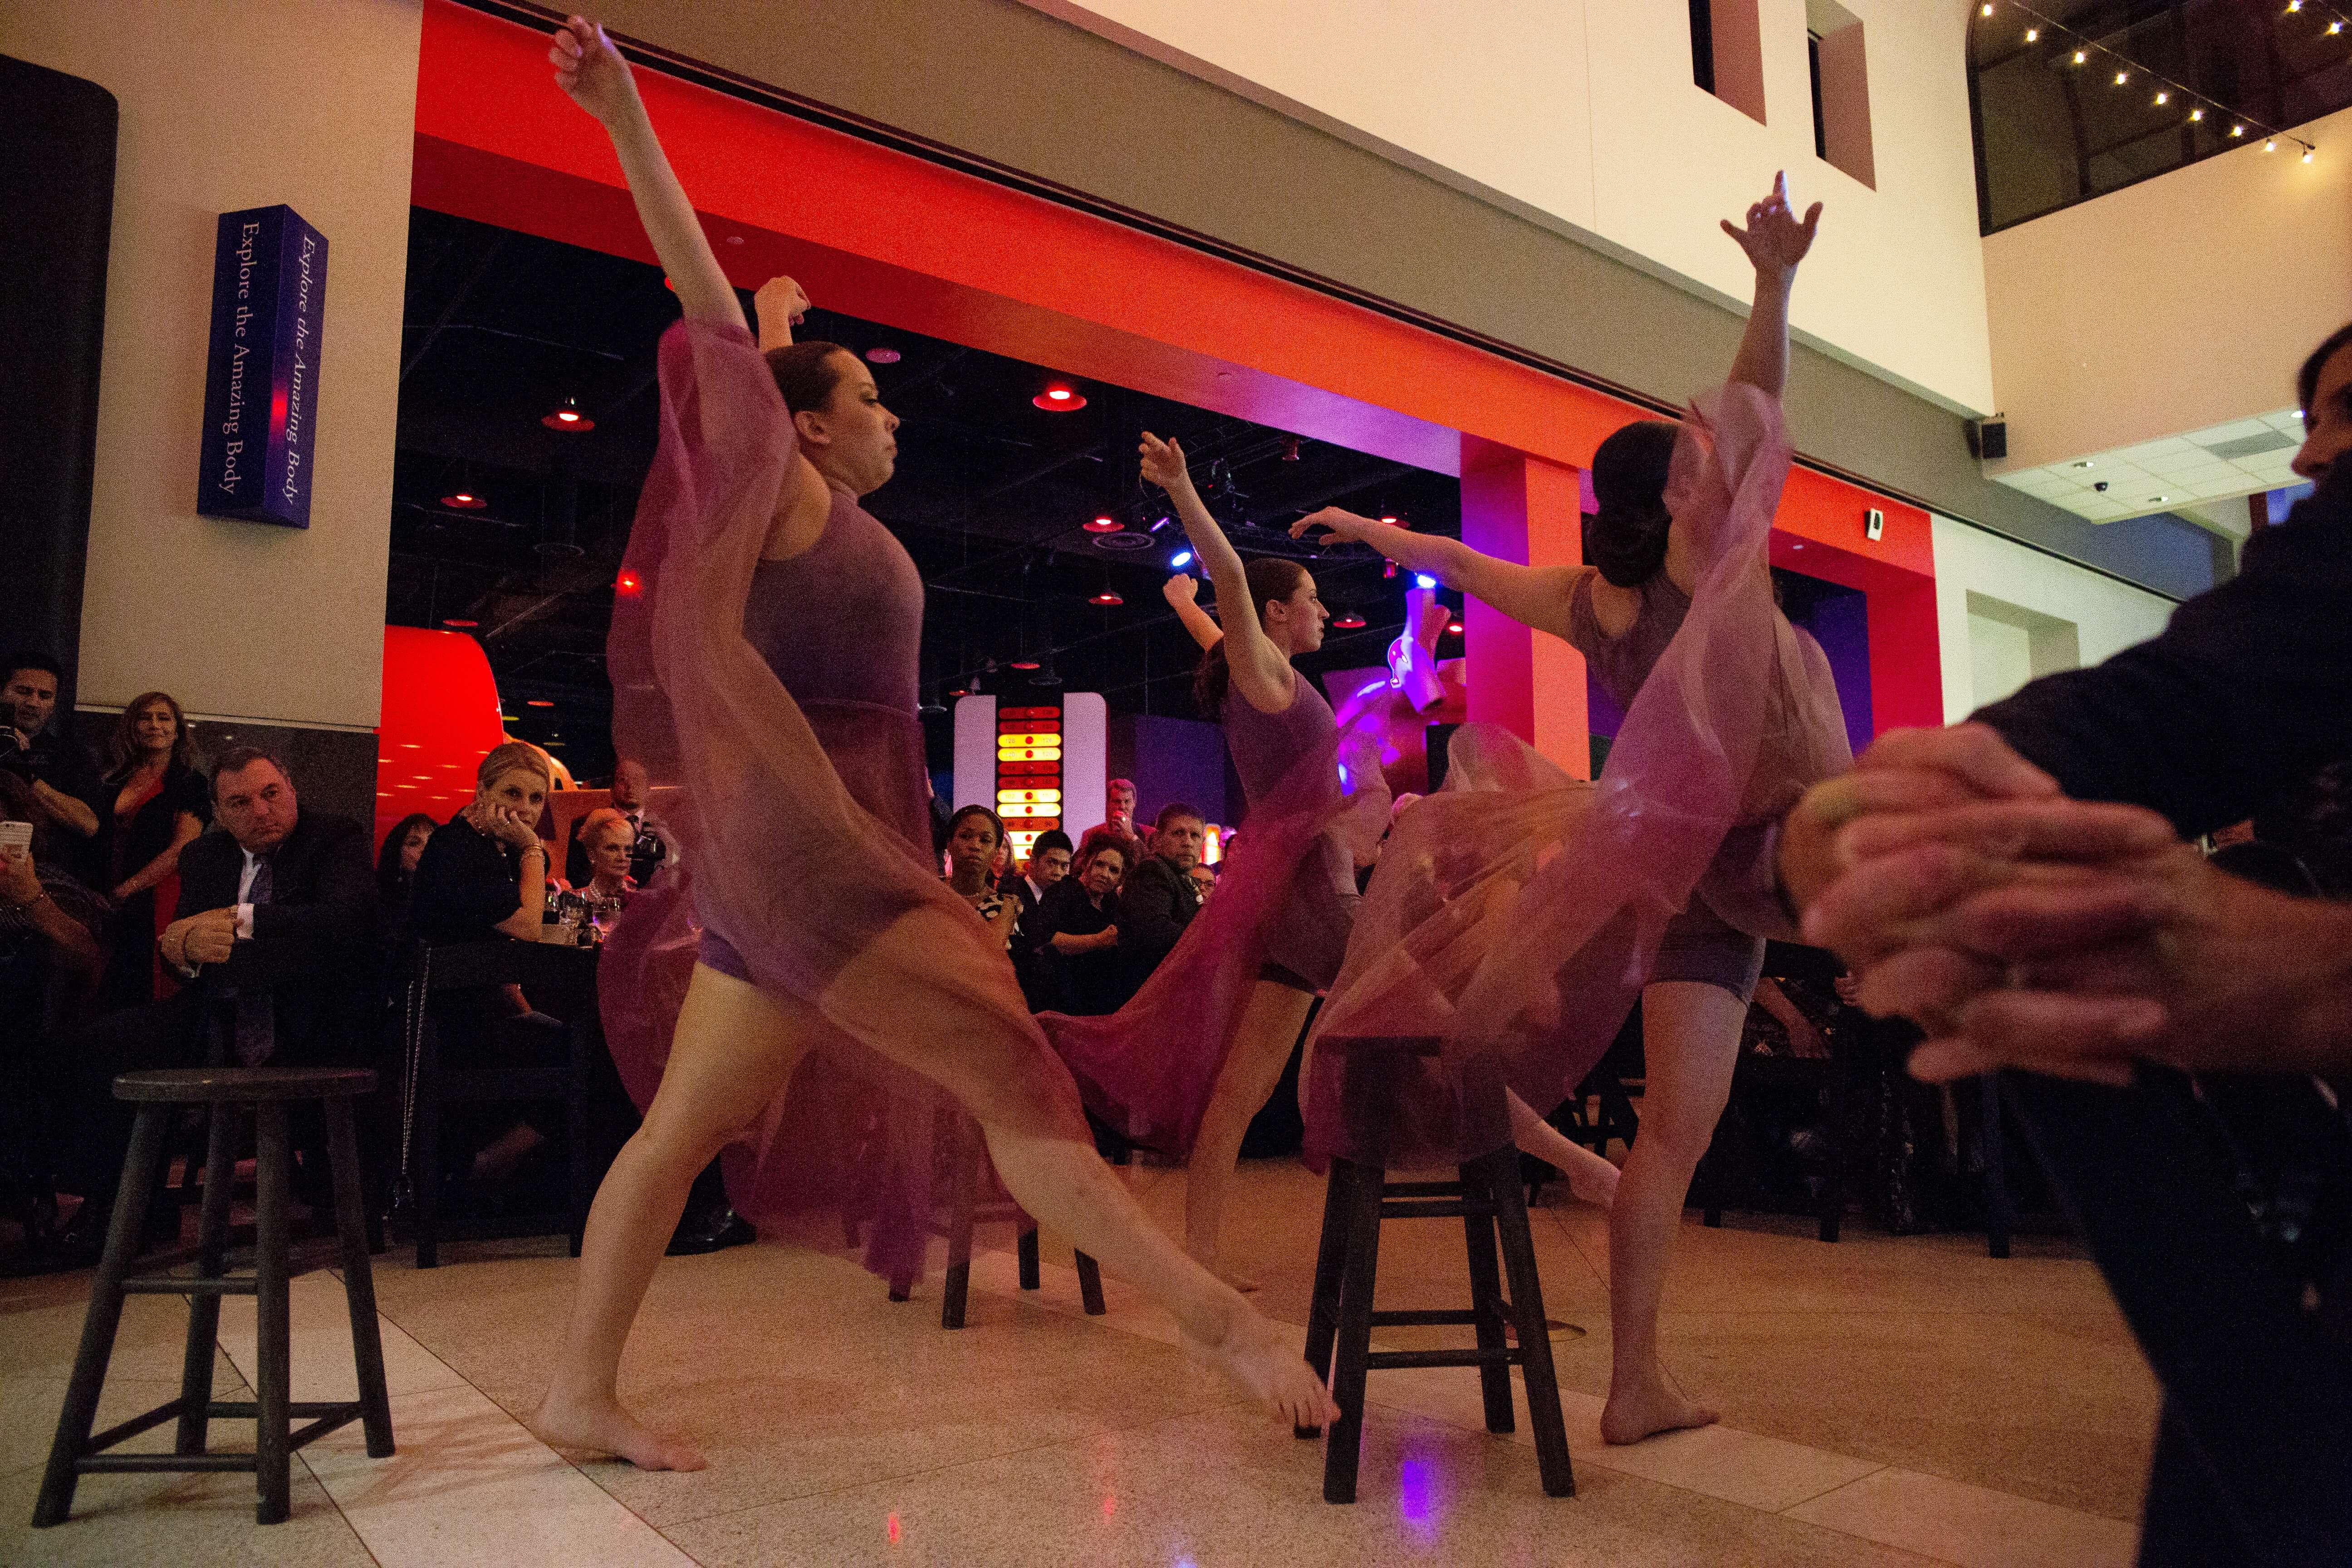 Interpretive dancers from Lamar University performed for gala guests.